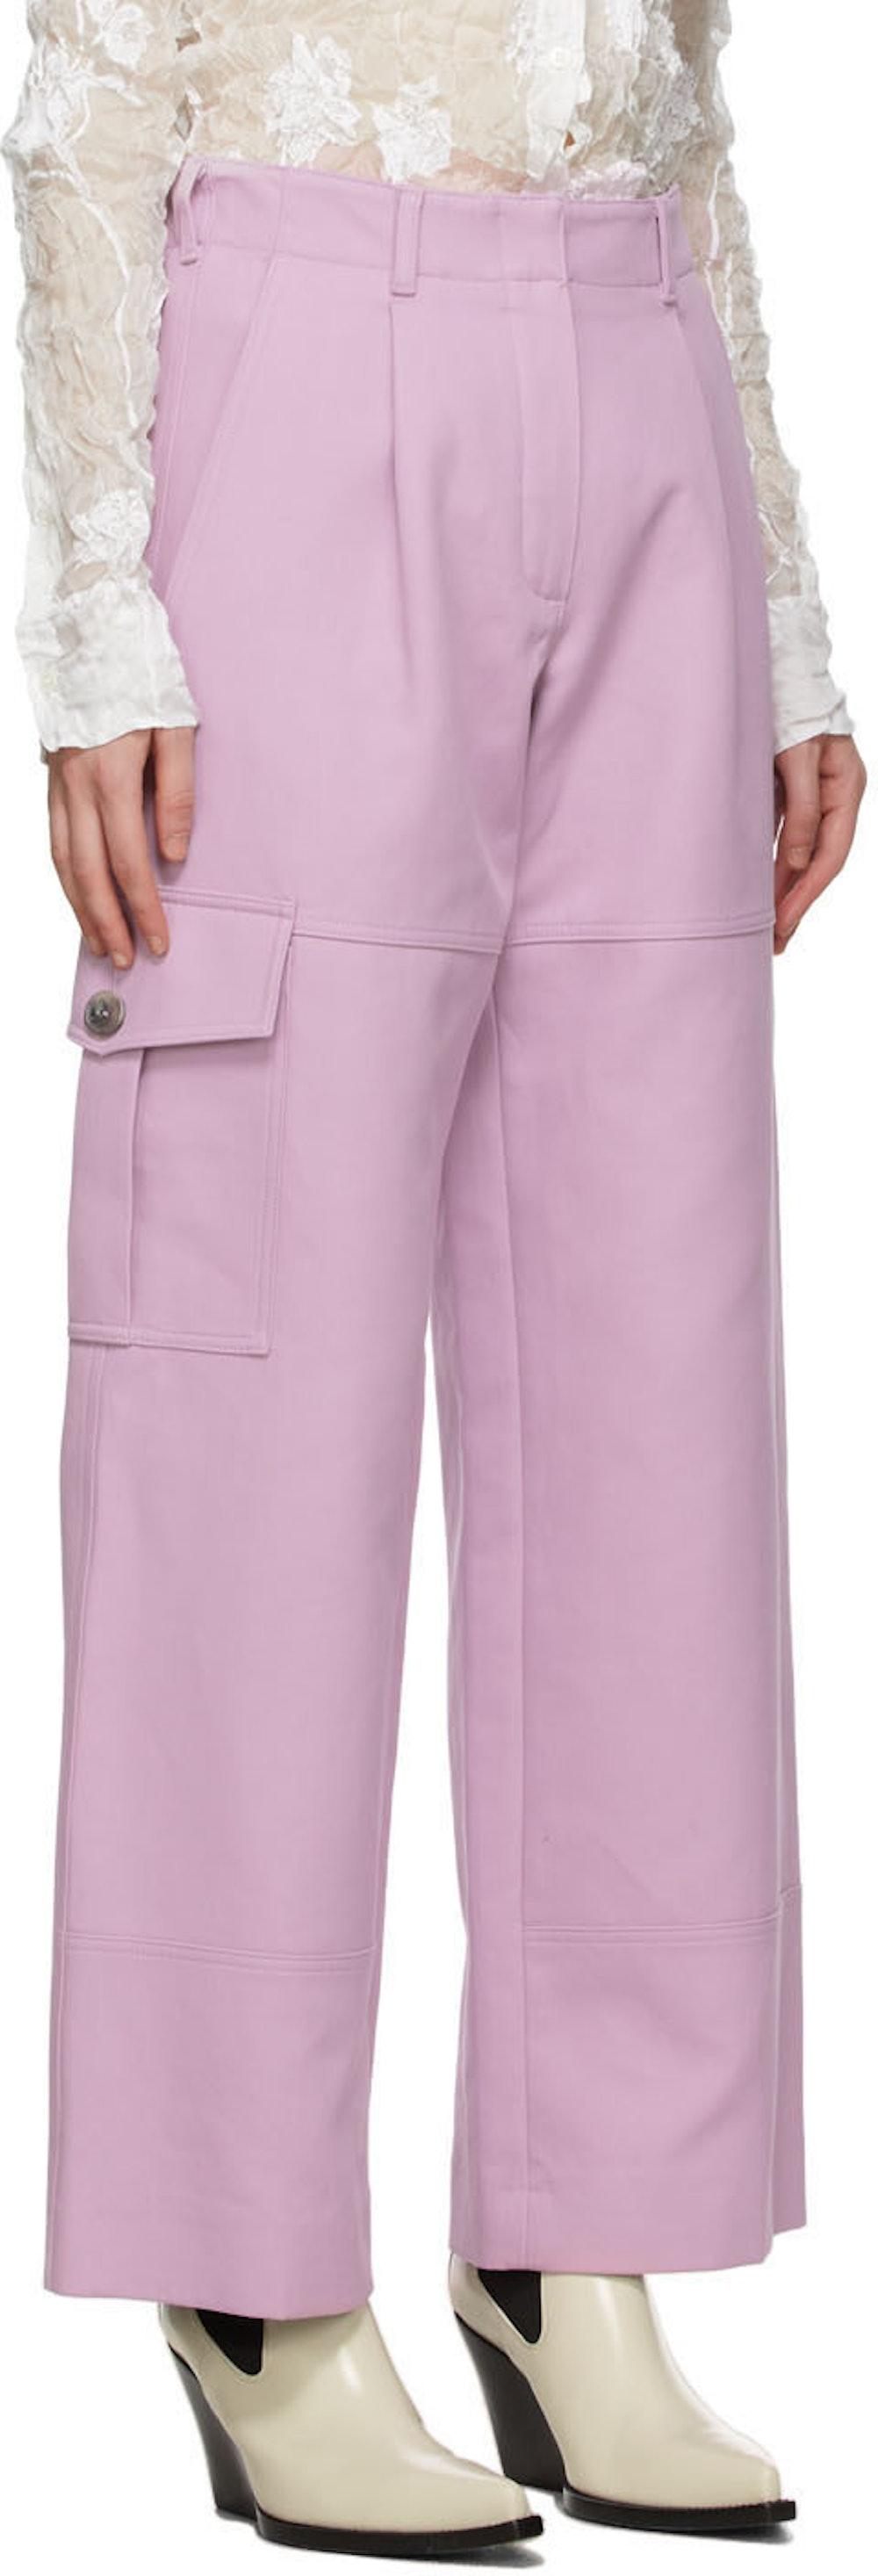 Nina Ricci Pink Twill Cargo Trousers